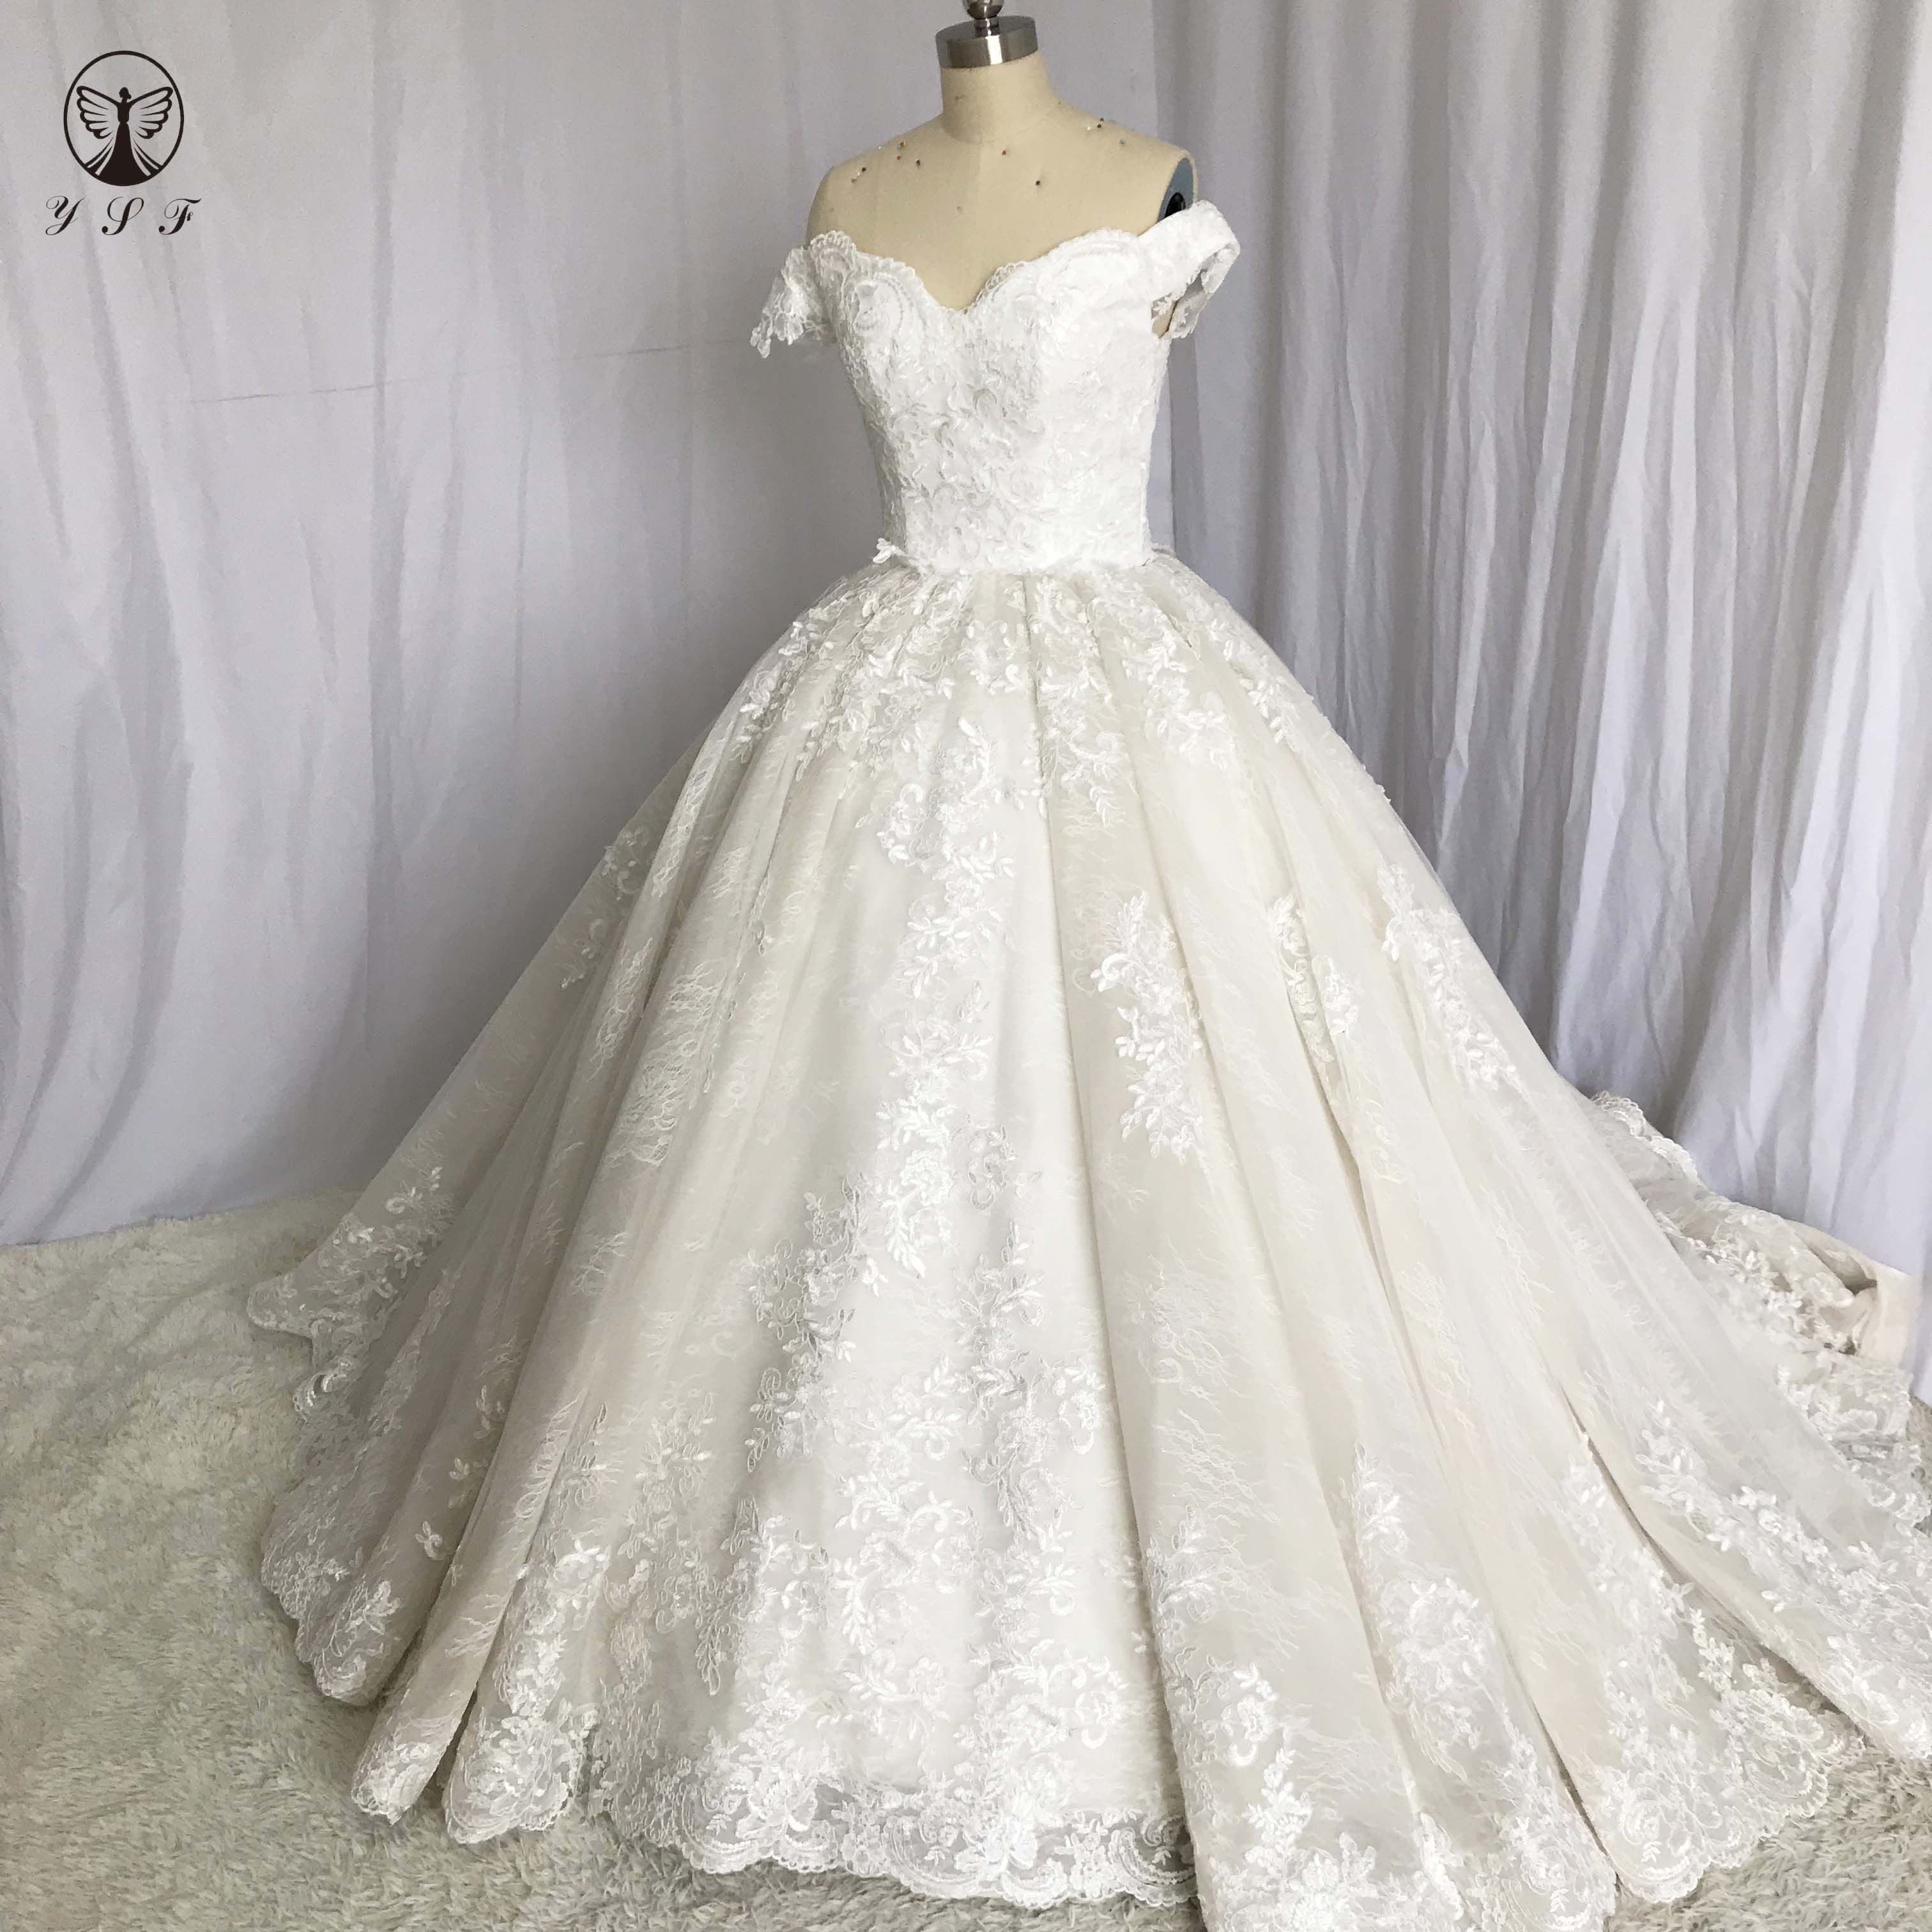 Designer Pernikahan De Novias Off Bahu Sayang Panjang Lengan Ball Gown Puffy Feather Wedding Dresses Cheap Store